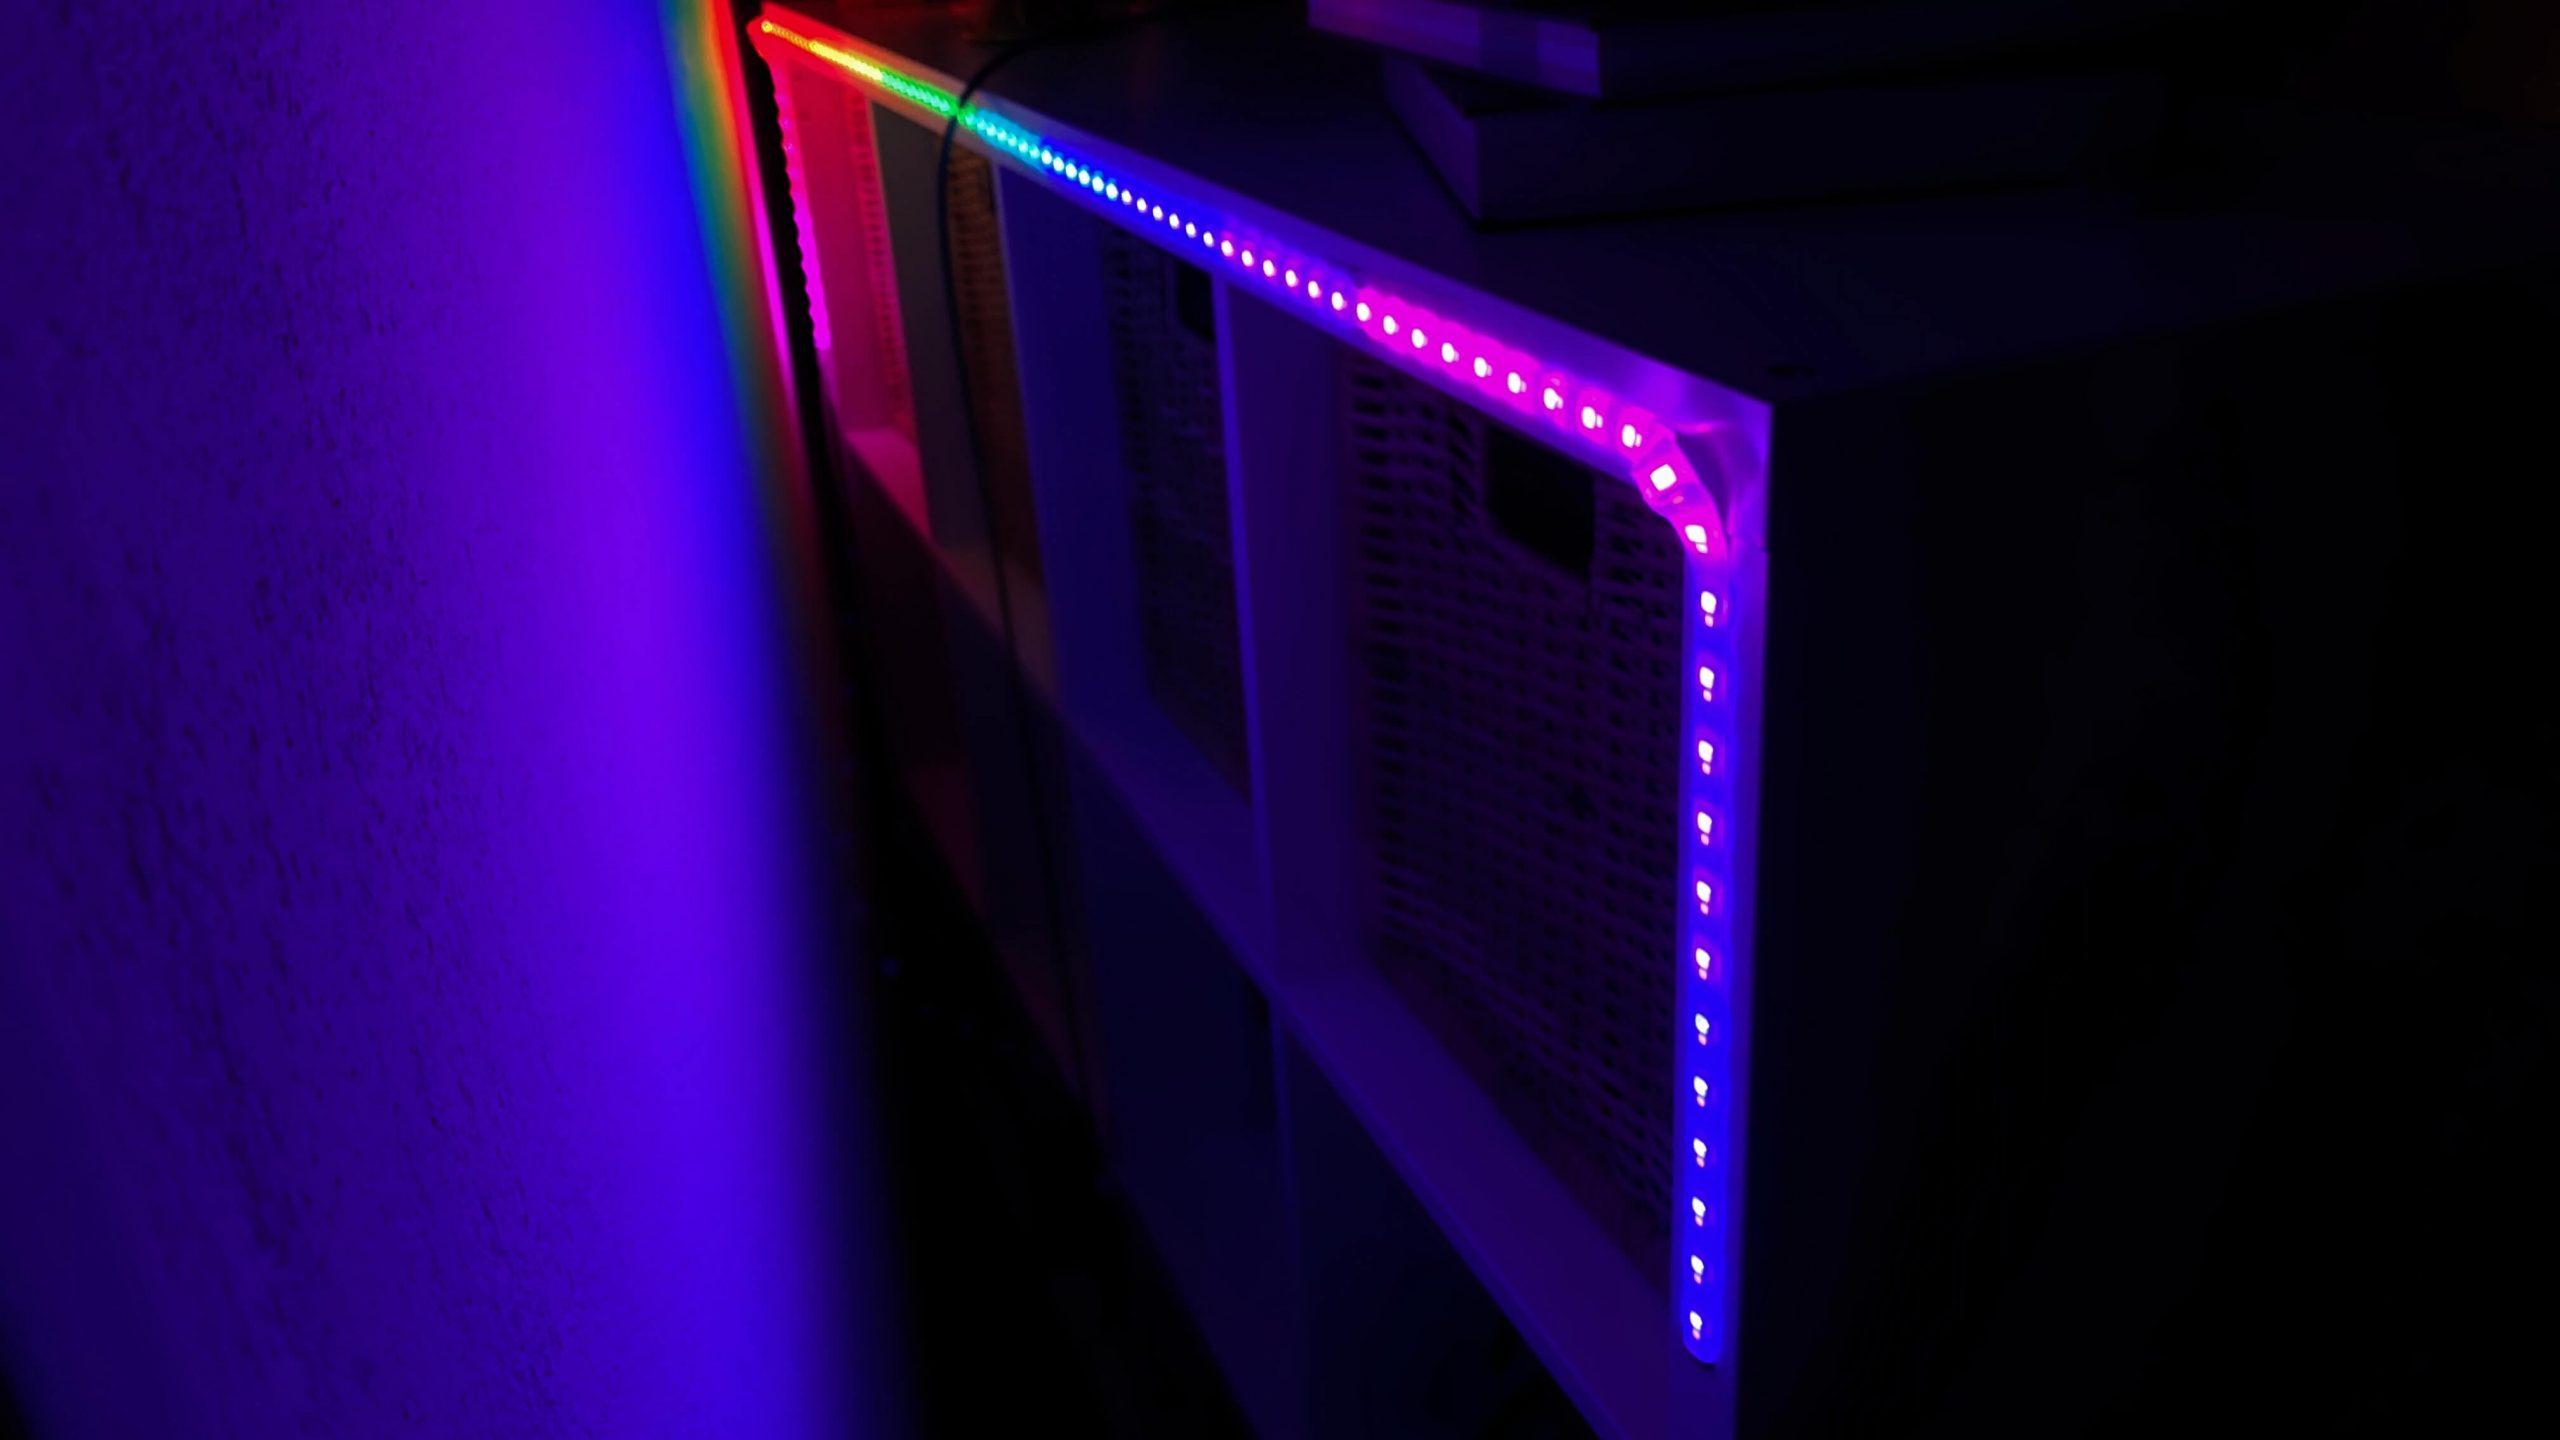 LIFX_Z_Strip_Apple_HomeKit_LED_SmartHome_Beleuchtung3-scaled LIFX Z-Strip mit Apple HomeKit - Beleuchtungsakzente gezielt setzen